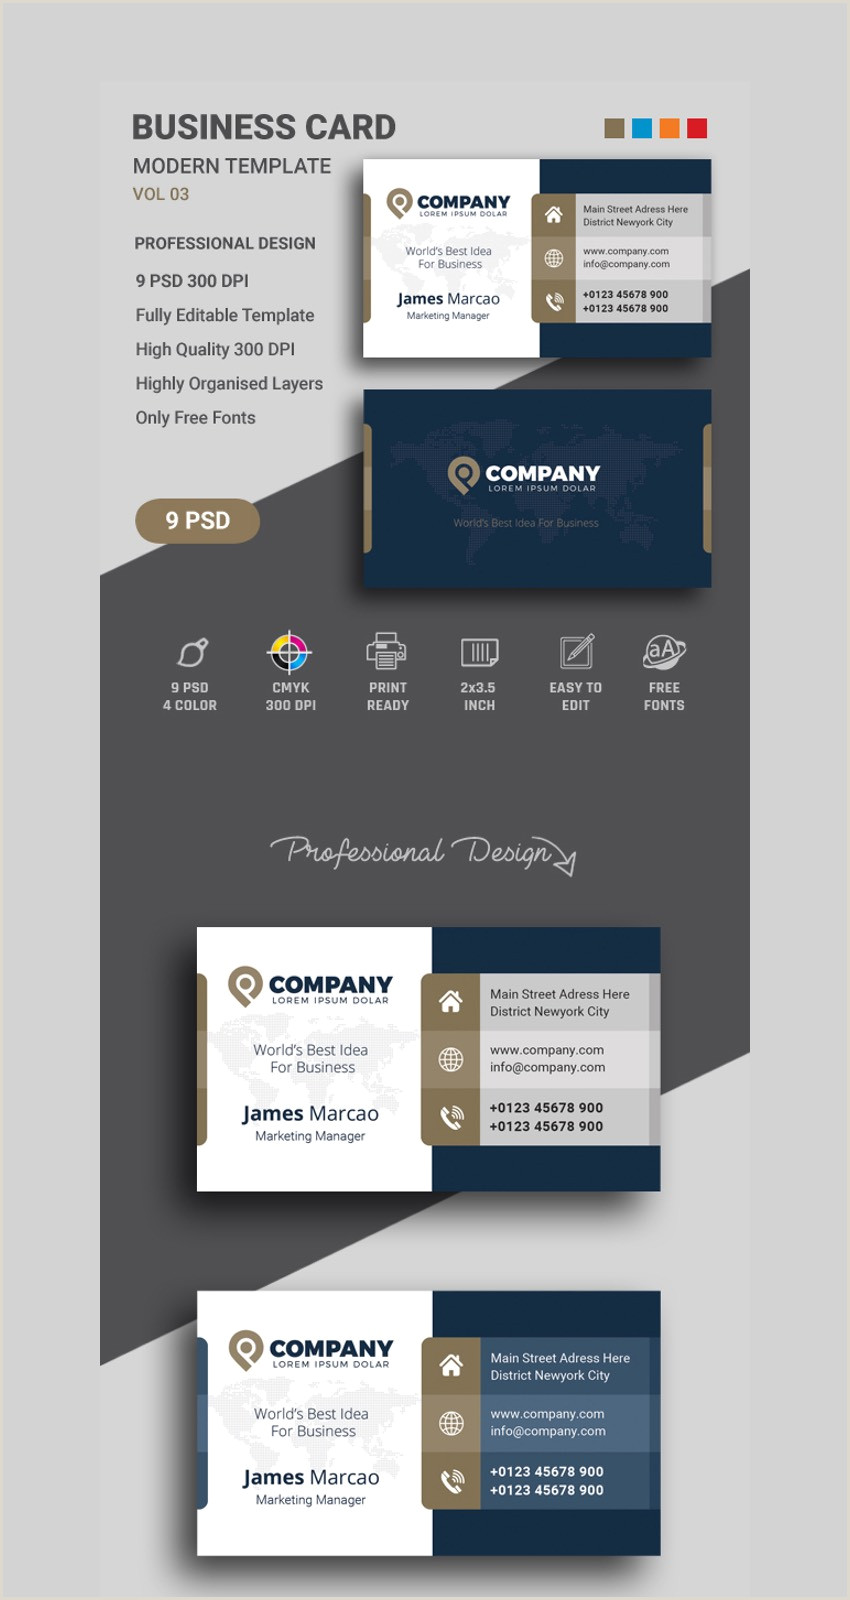 Customize Unique Business Cards 20 Customizable Business Cards Download Design & Print